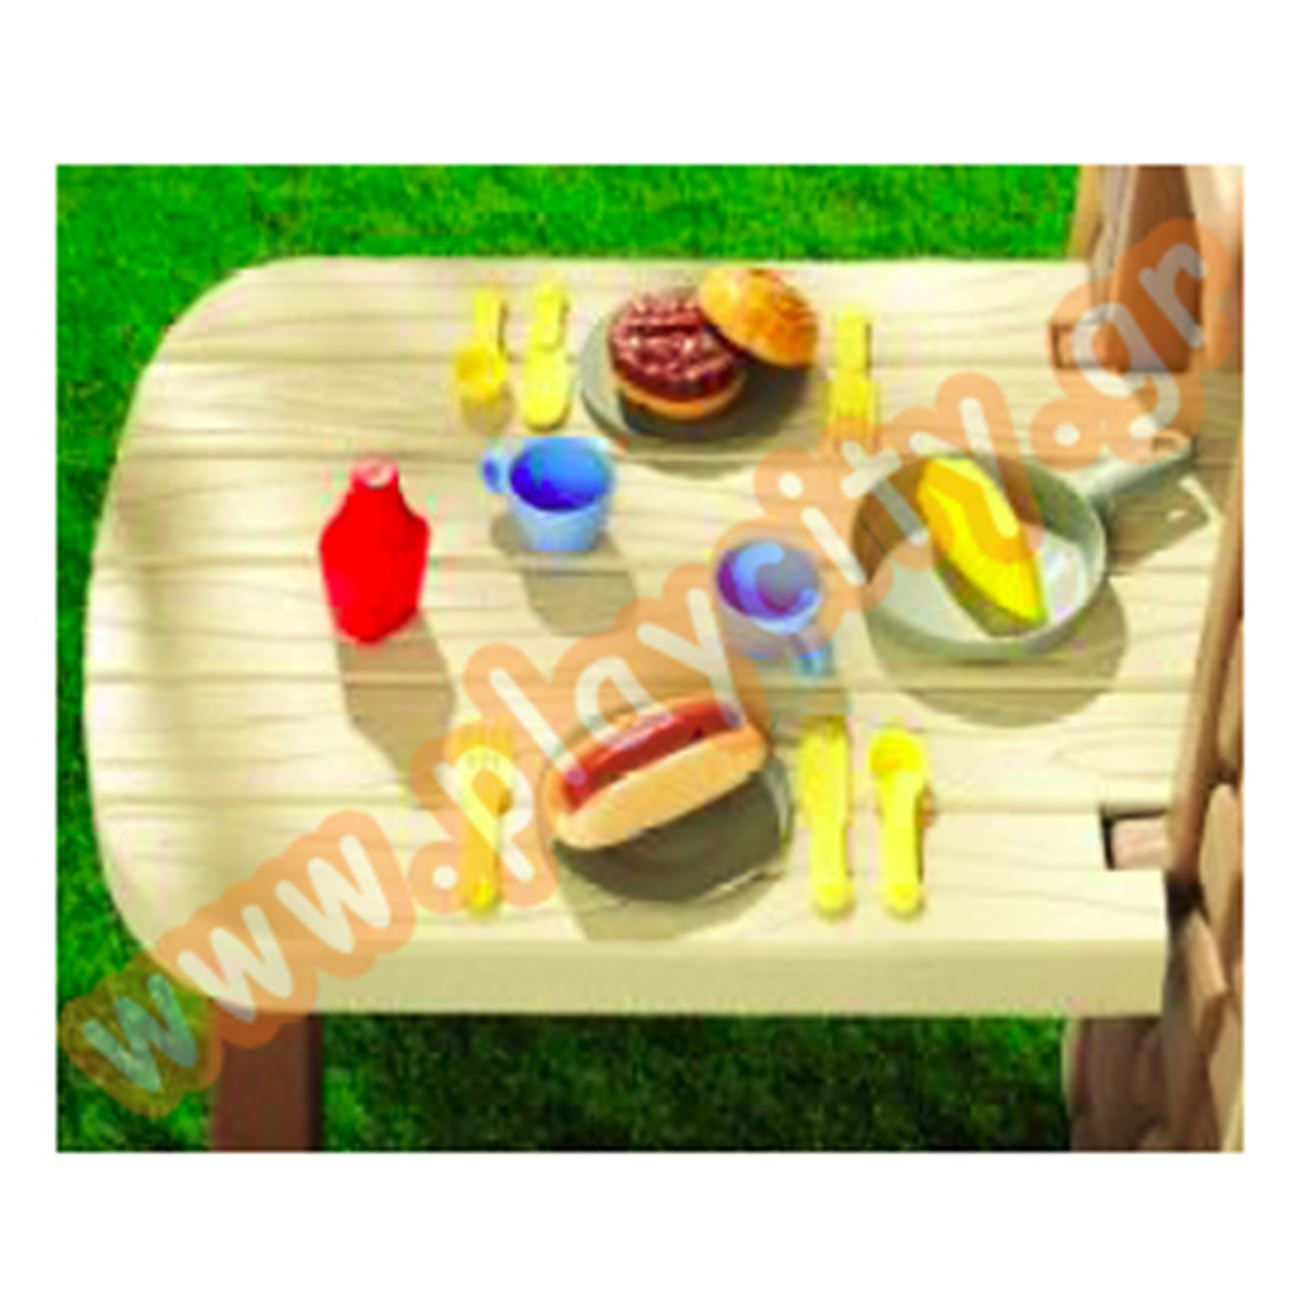 f7416dd34a46 Παιχνίδια Εξωτερικού Χώρου και Μίμησης Little Tikes Πλαστικό παιδικό ...